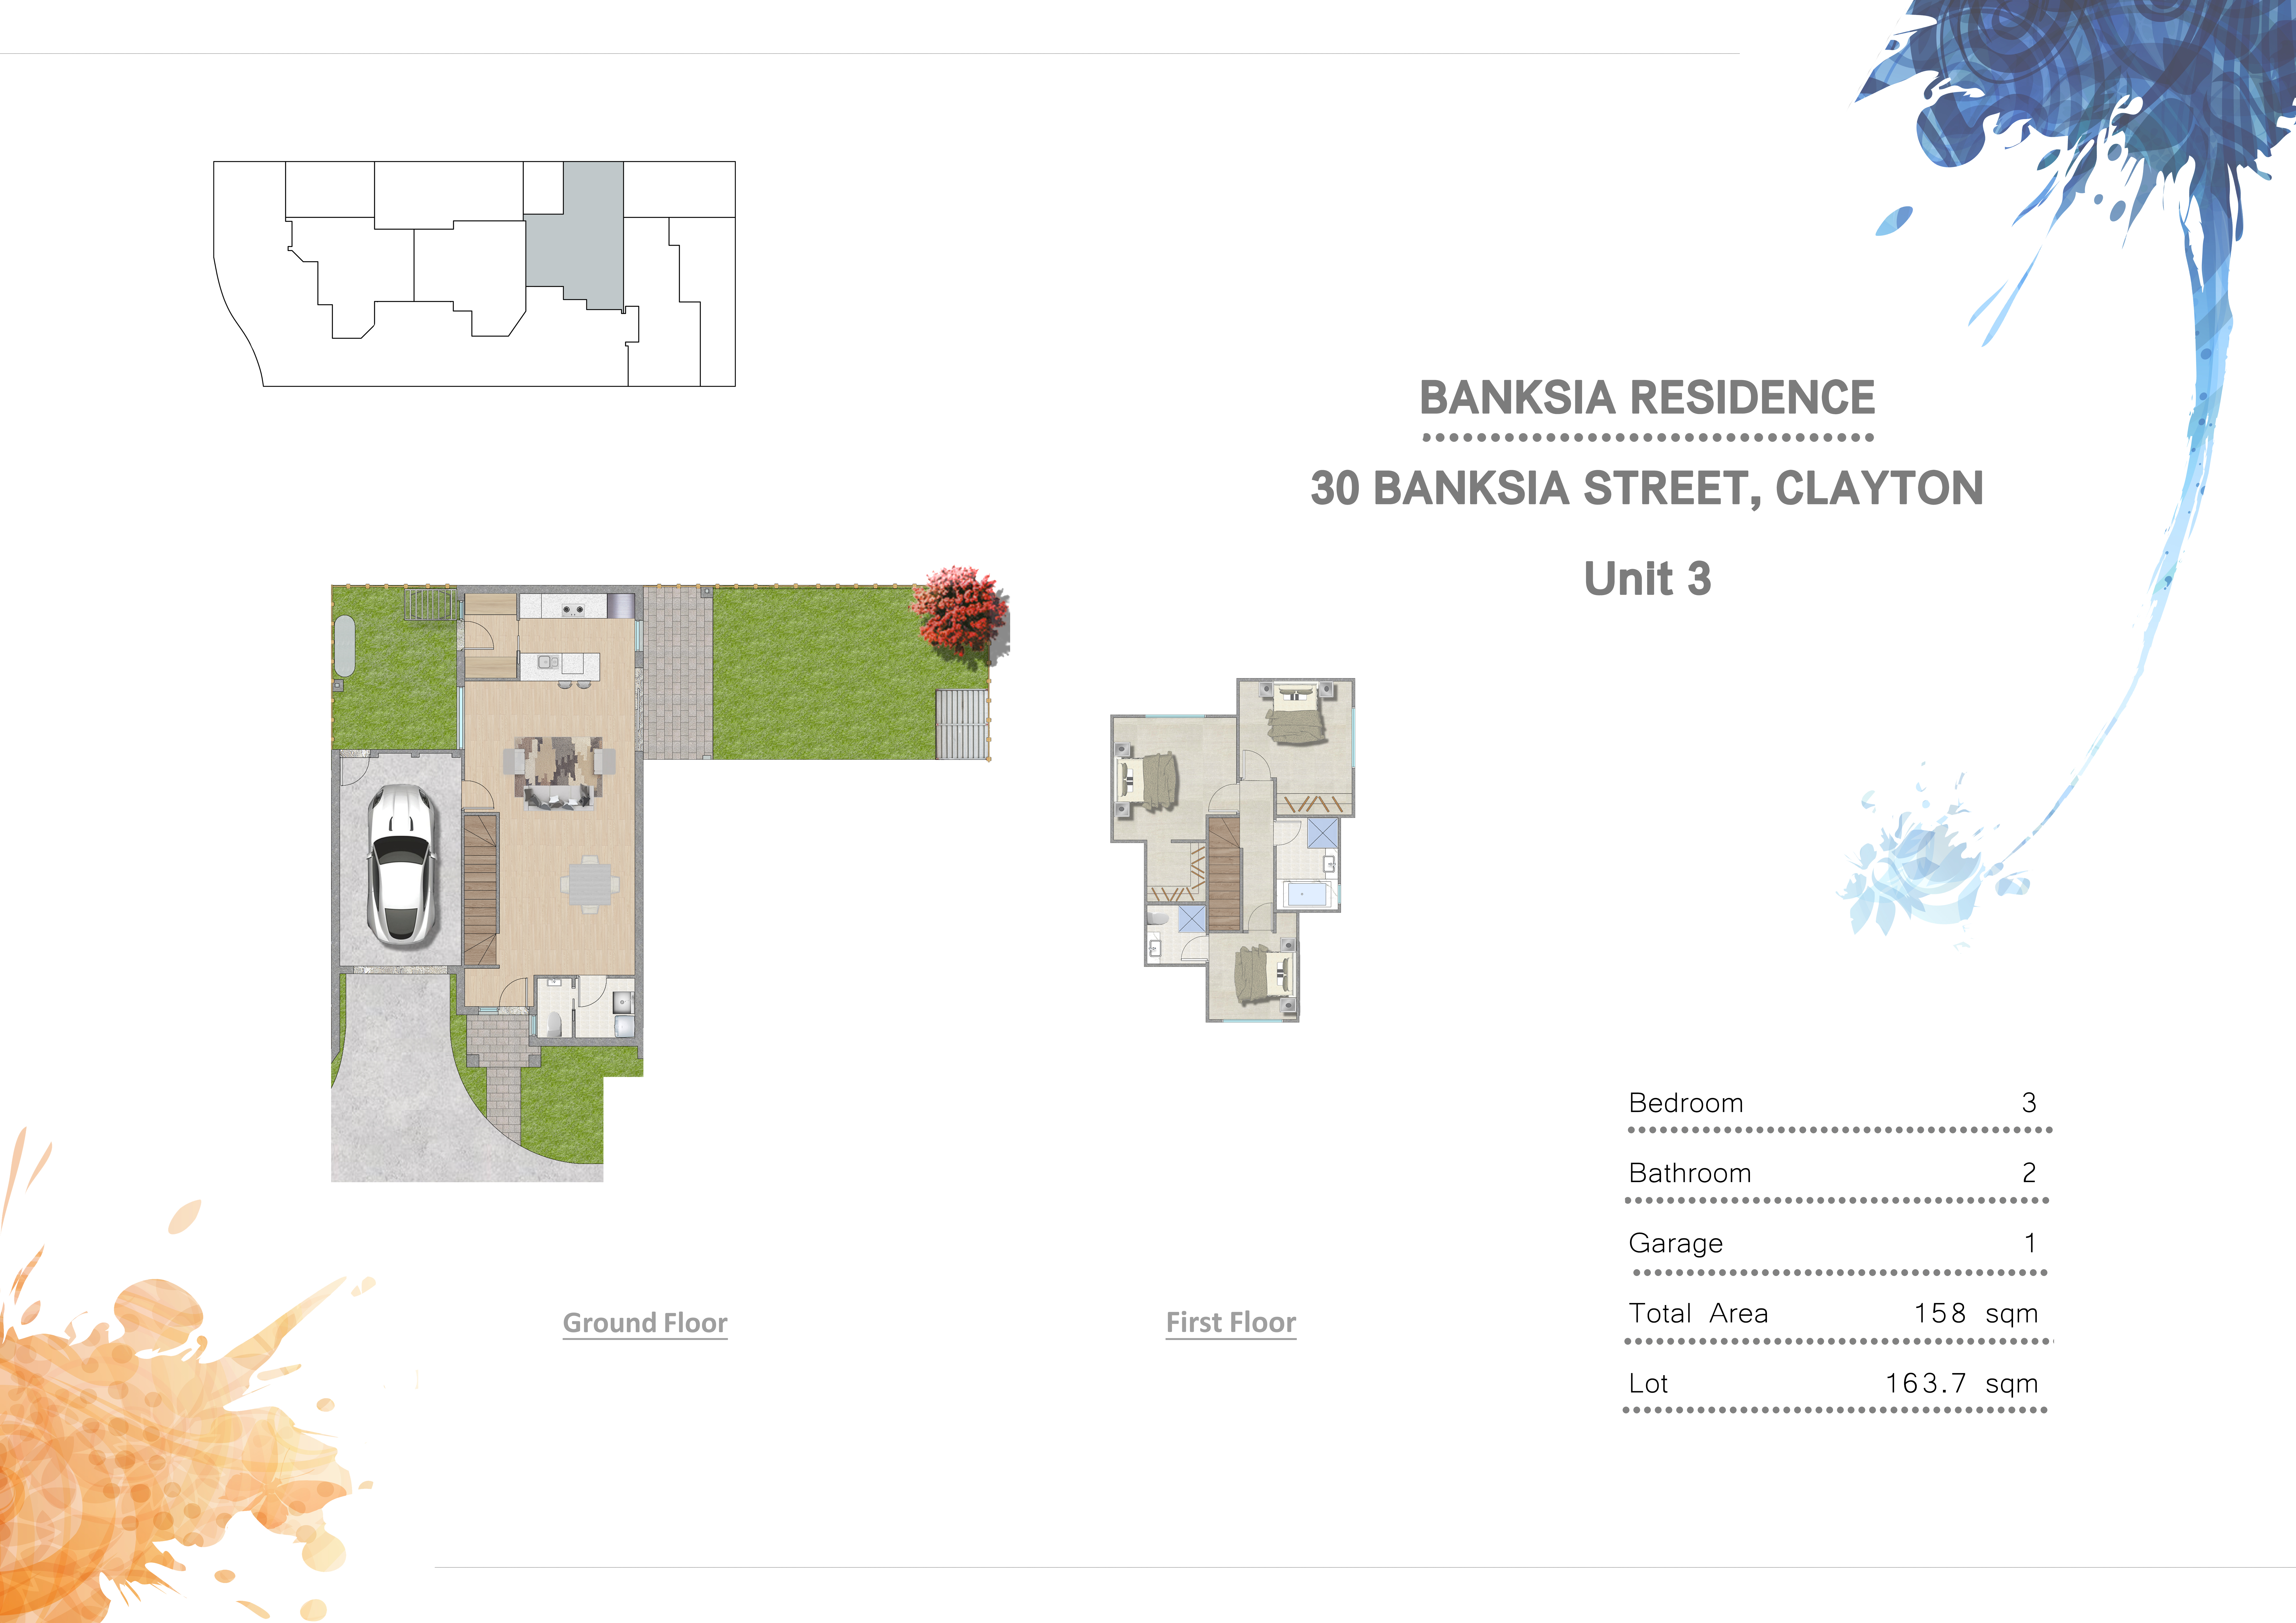 11402_197235_Unit 3 Floor Plan